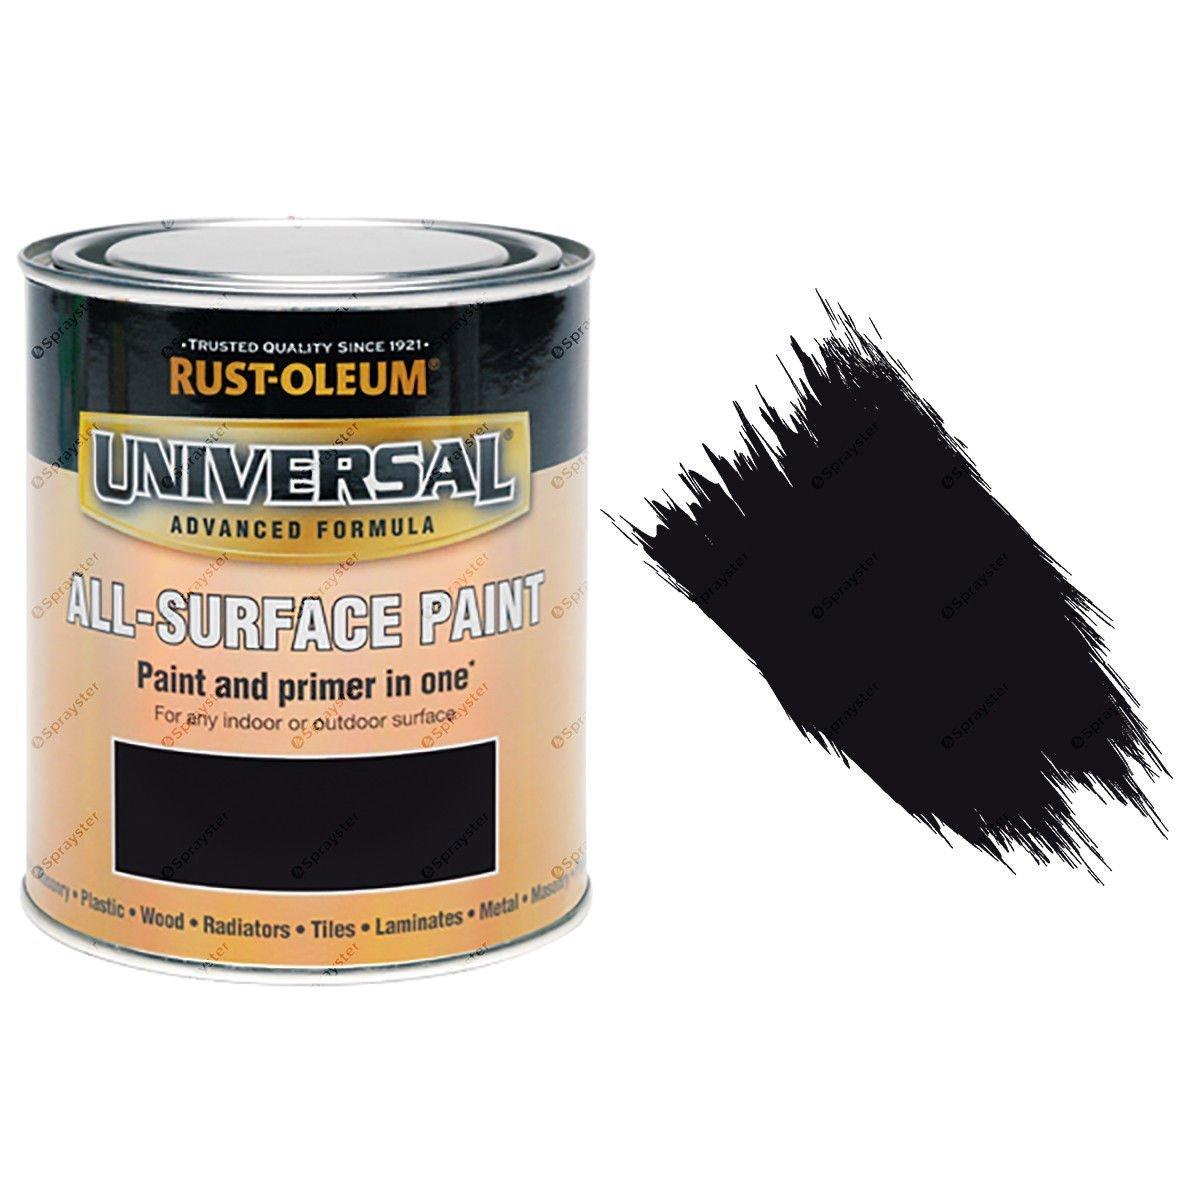 Rust-Oleum-Universal-All-Surface-Self-Primer-Brush-Paint-Satin-Black-250ml-391986702359